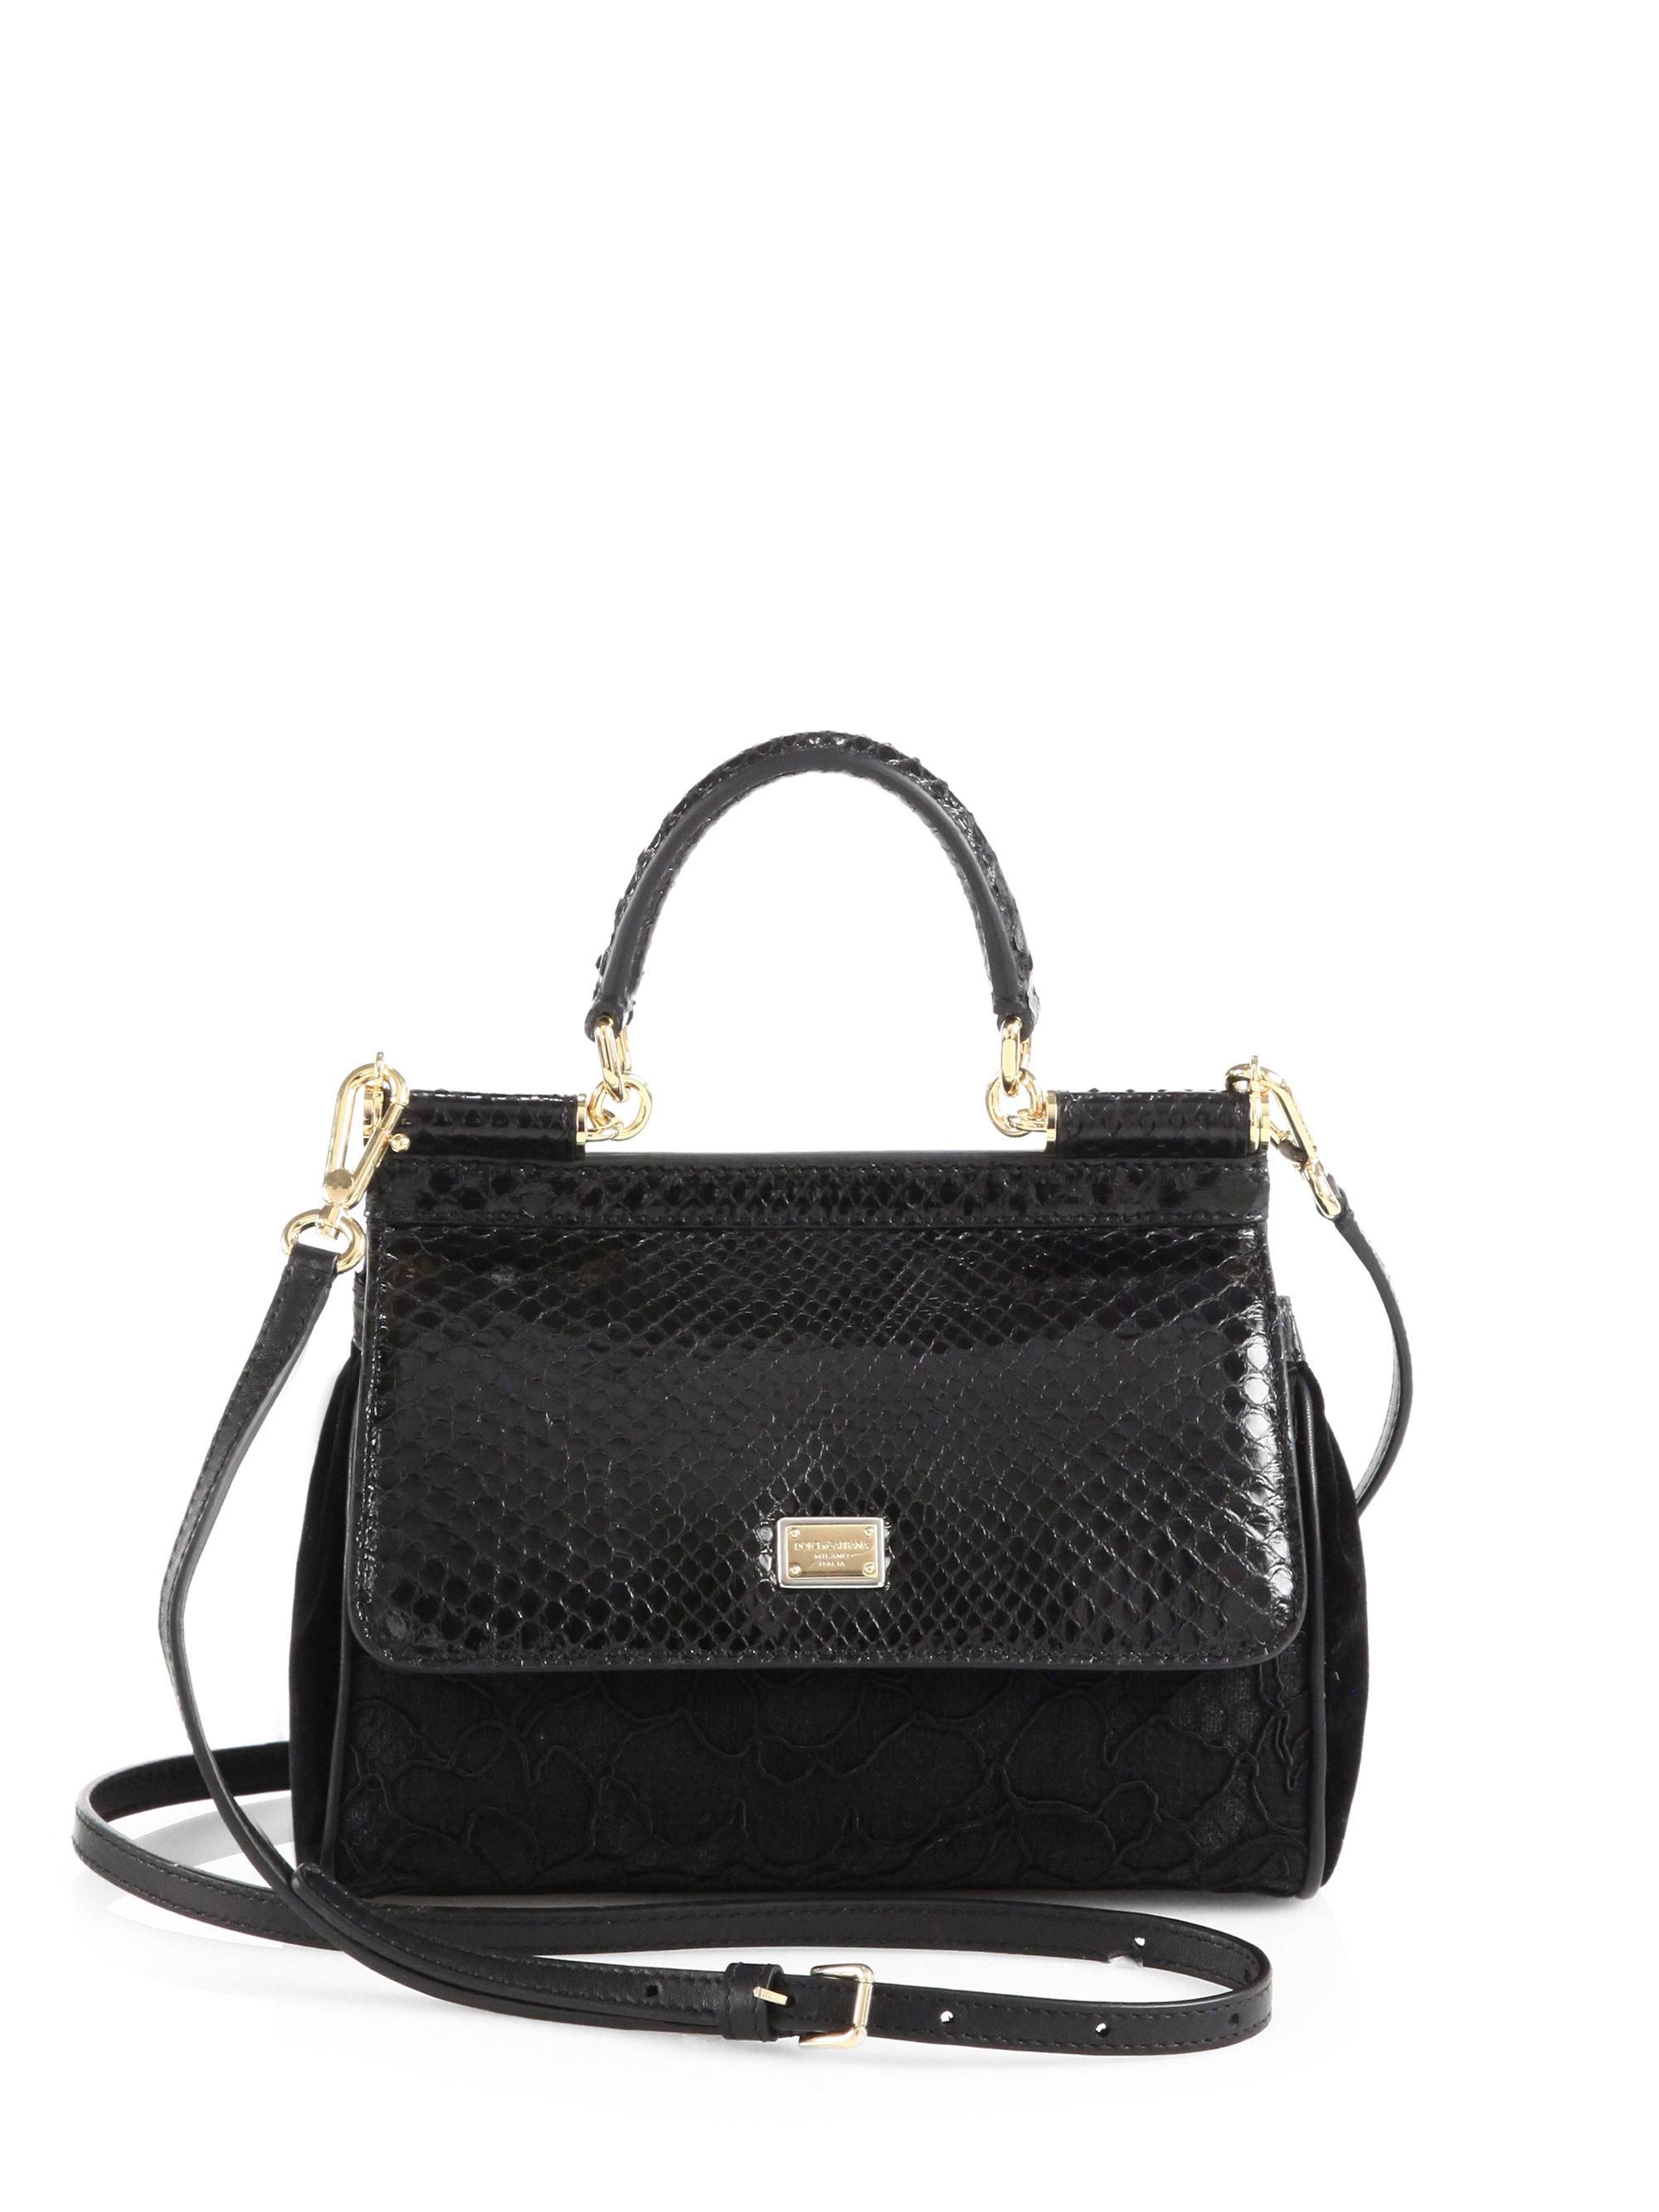 Lyst - Dolce   Gabbana Sicily Mixedmedia Mini Top Handle Bag in Black 7fa2a0bc21a49